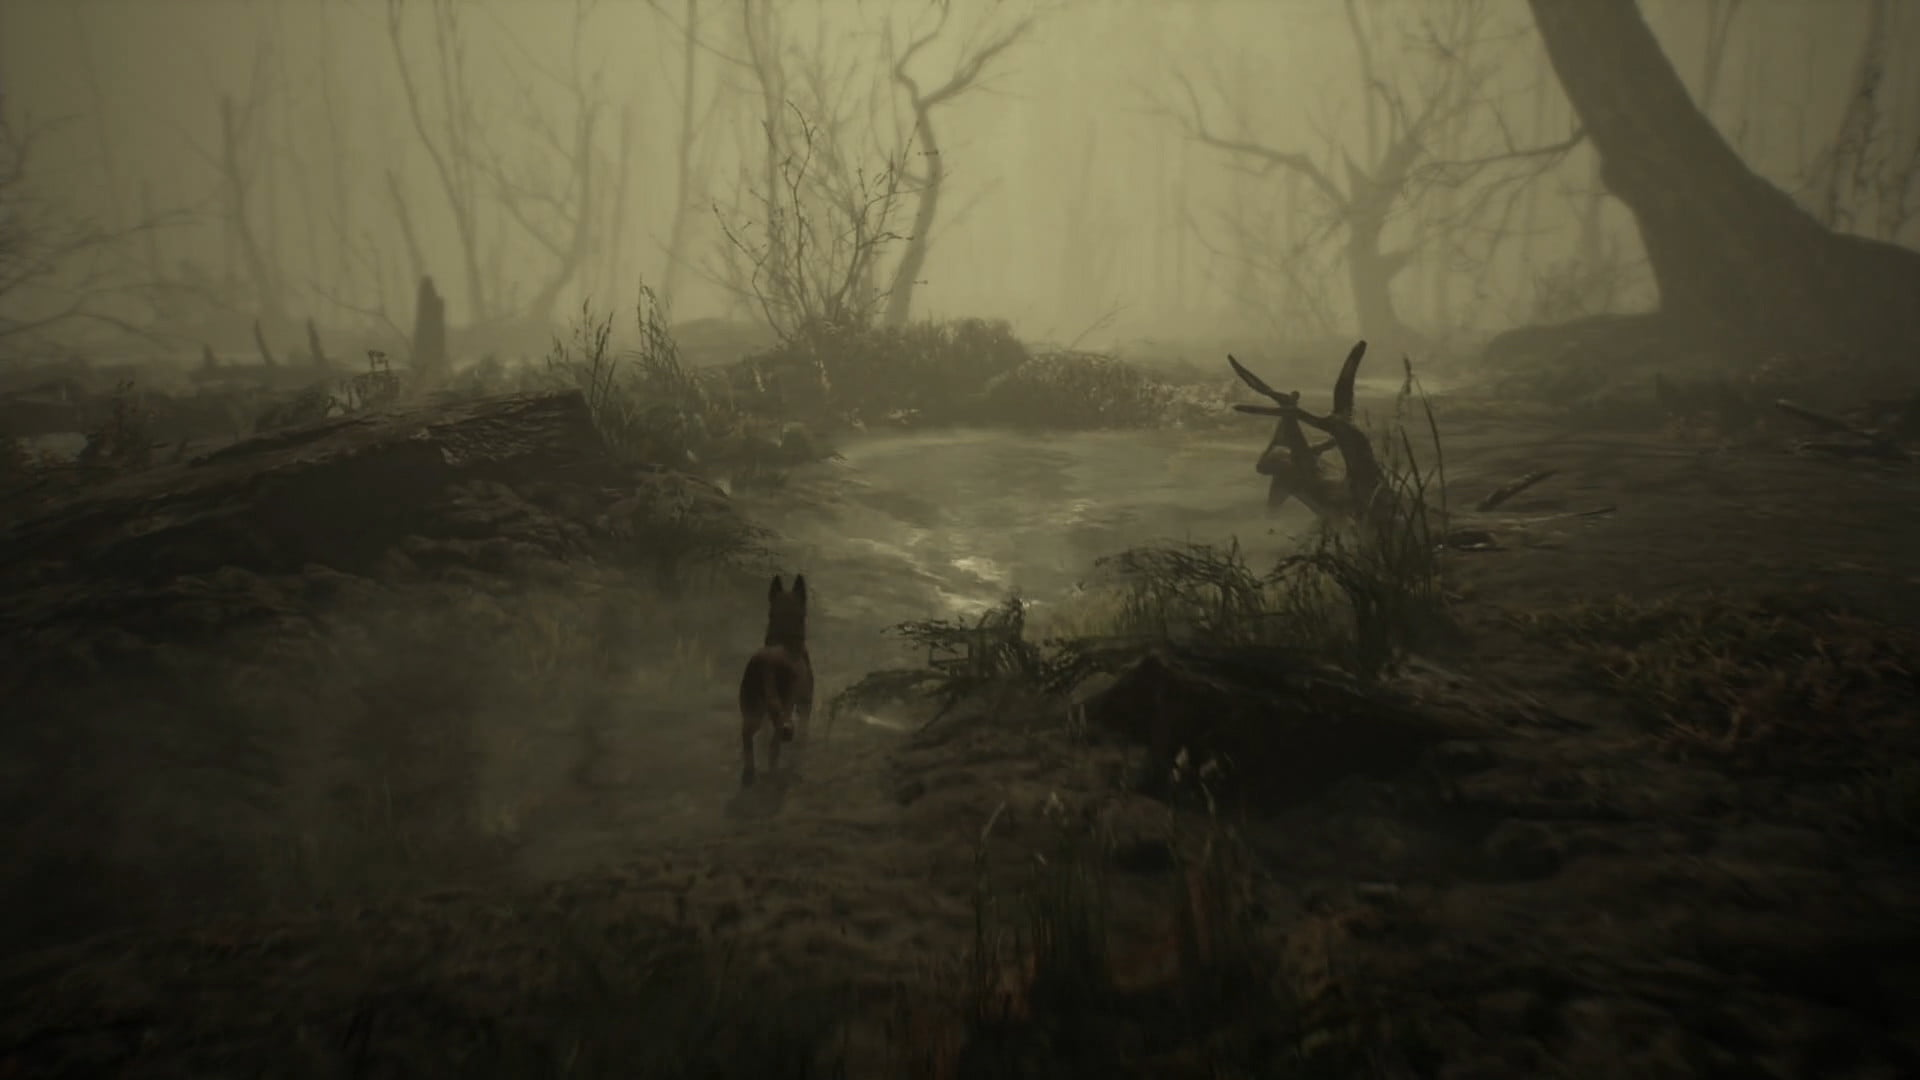 Risultati immagini per blair witch game